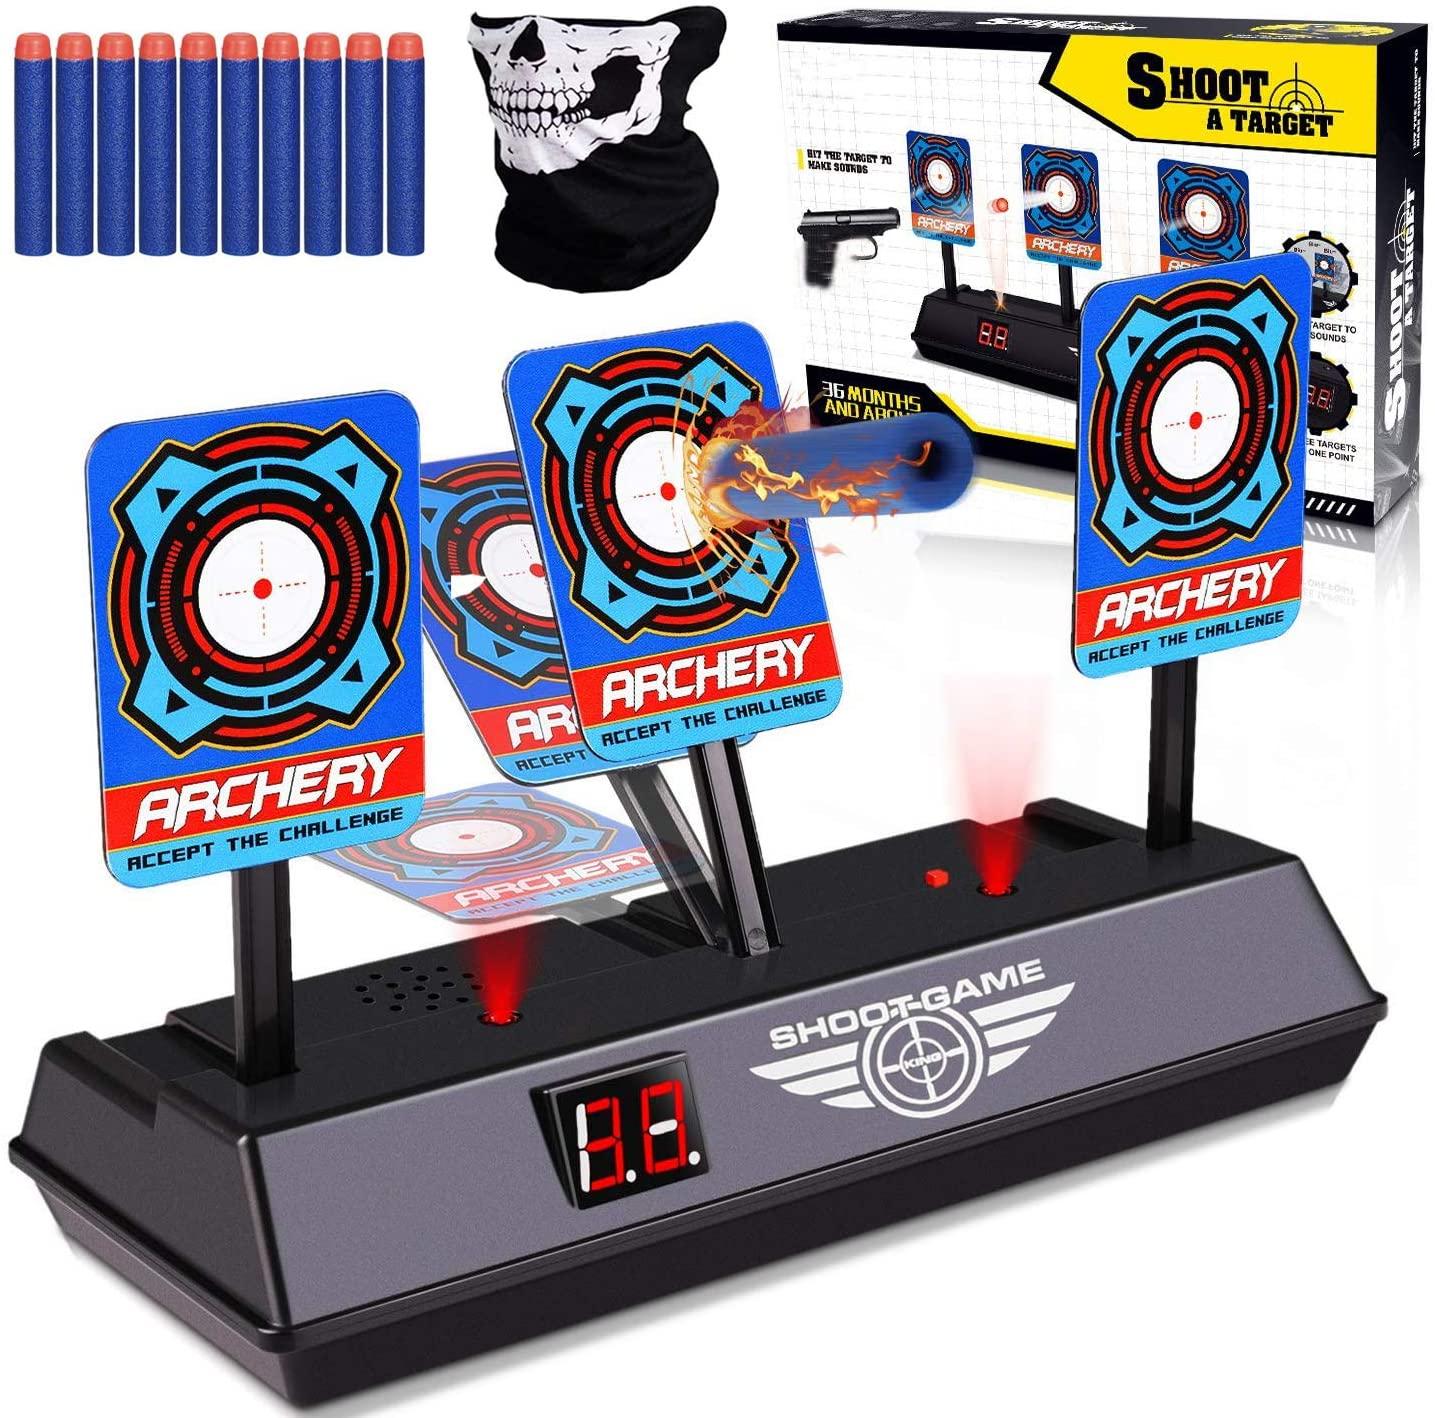 Petask Shooting Digital Target for Nerf Guns Blaster N-Strike Elite Mega Rival Kids Electric Scoring Auto Reset Targets Toys for Boys and Girls